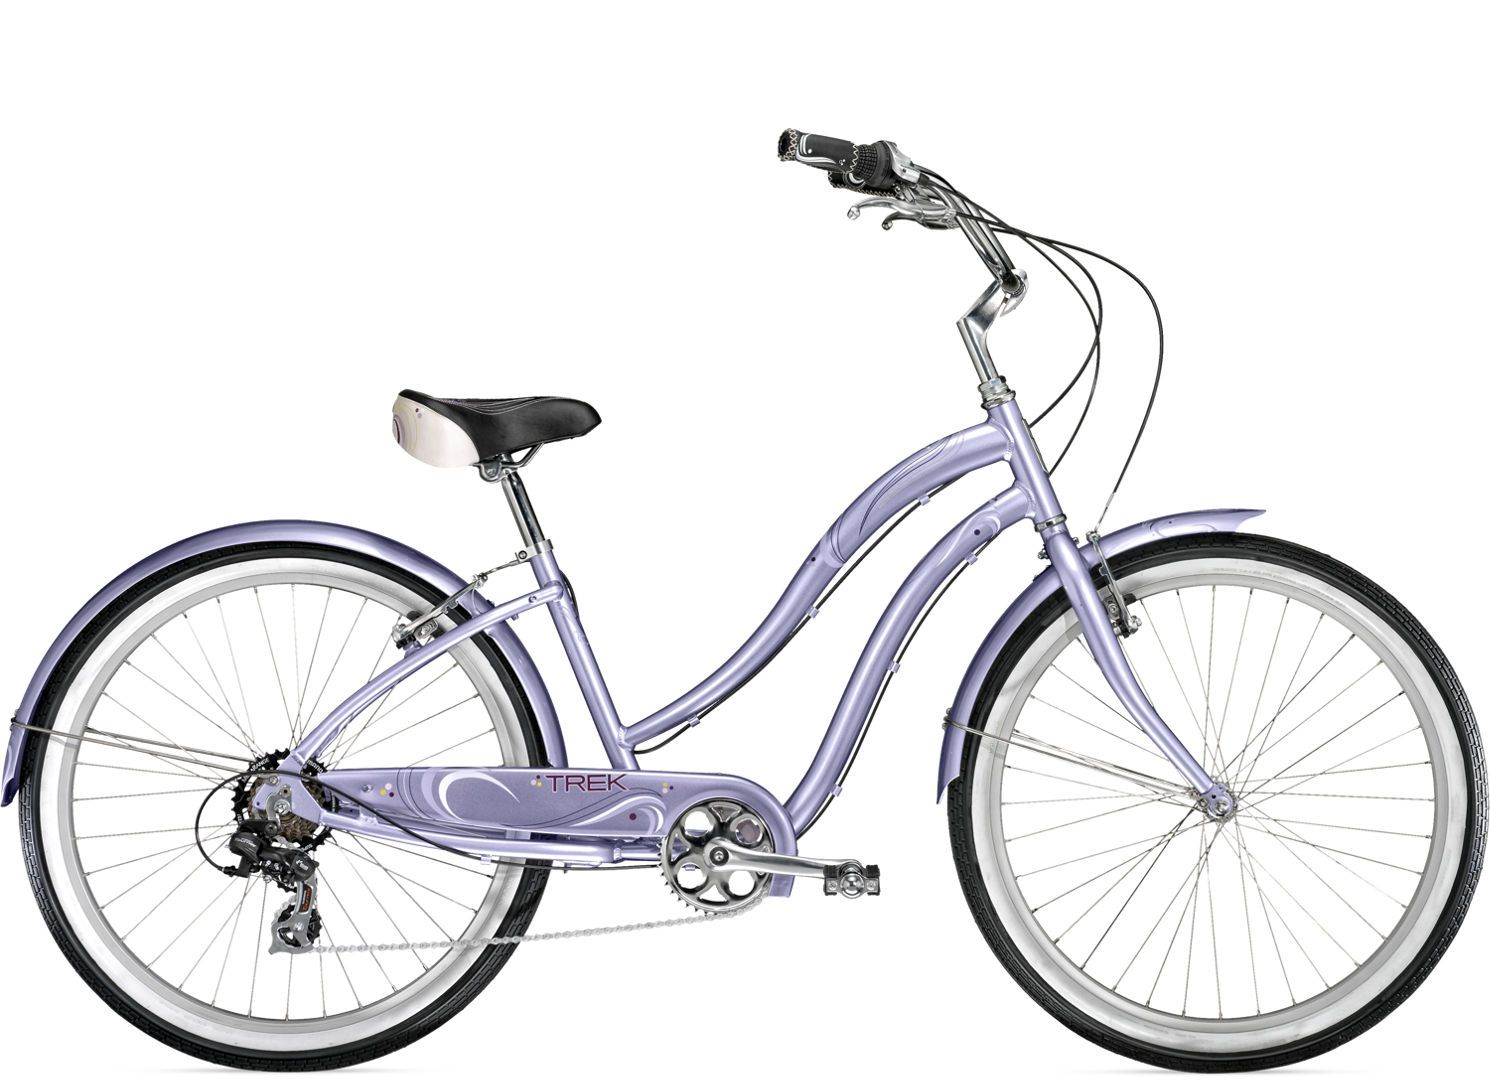 Calypso Women S Trek Bicycle Perfect Beach Cruiser With